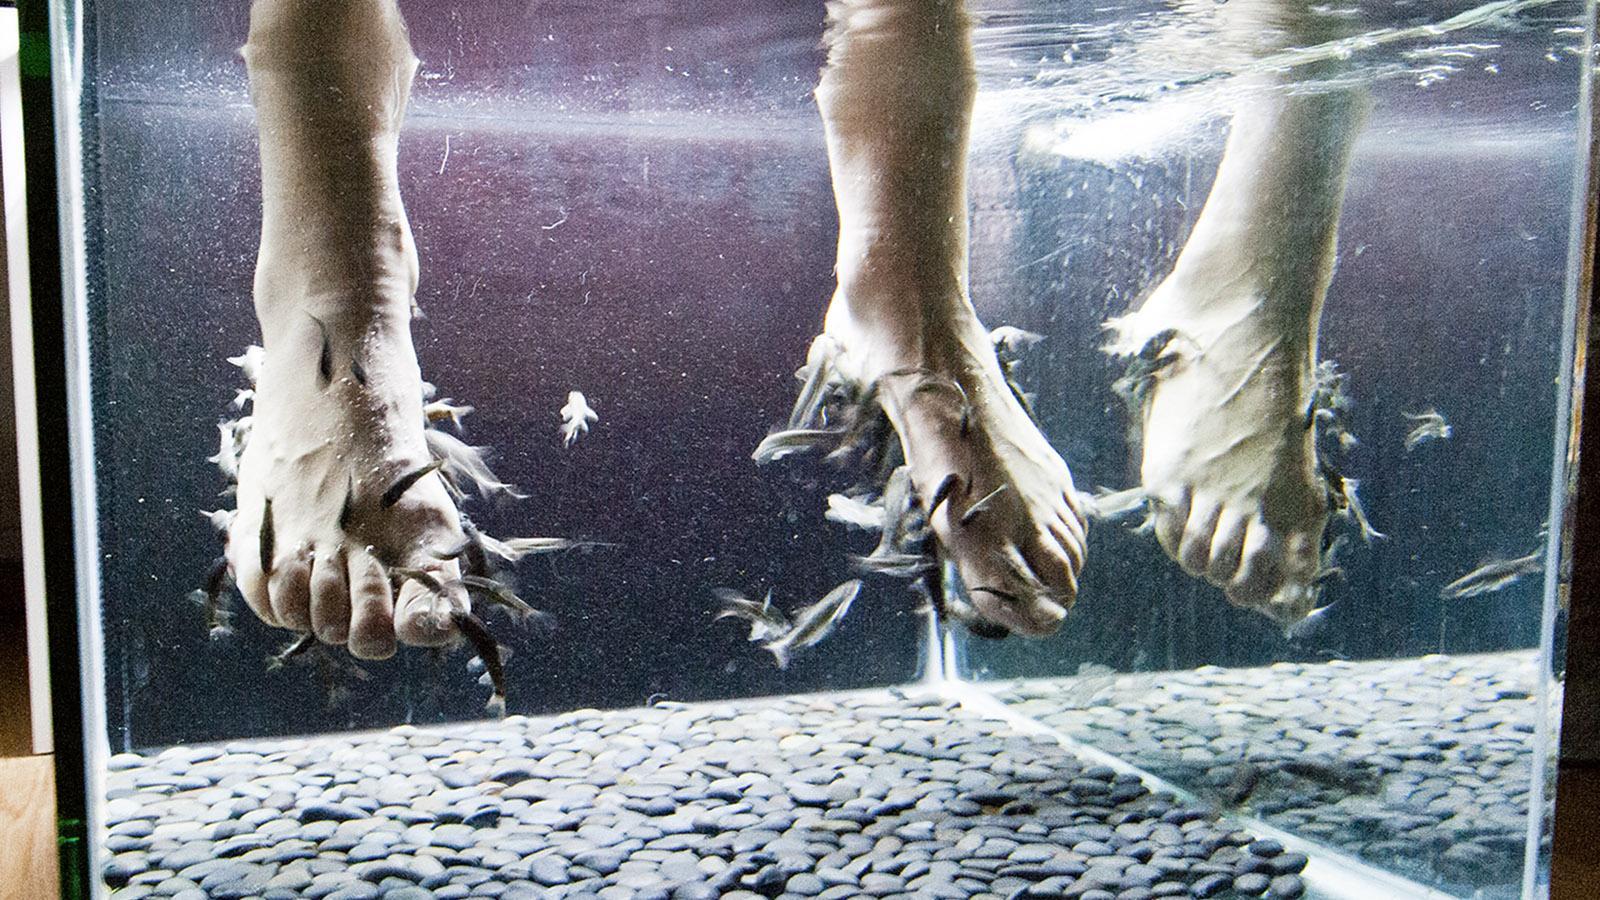 Pariser Passagen. Bei ZZZ Zen - Le Bar à Sieste in der Passage Courseul knabbern kleine Fische eure Hornhaut an den Füßen fort. Es kitzelt ein wenig! Foto: Hilke Maunder